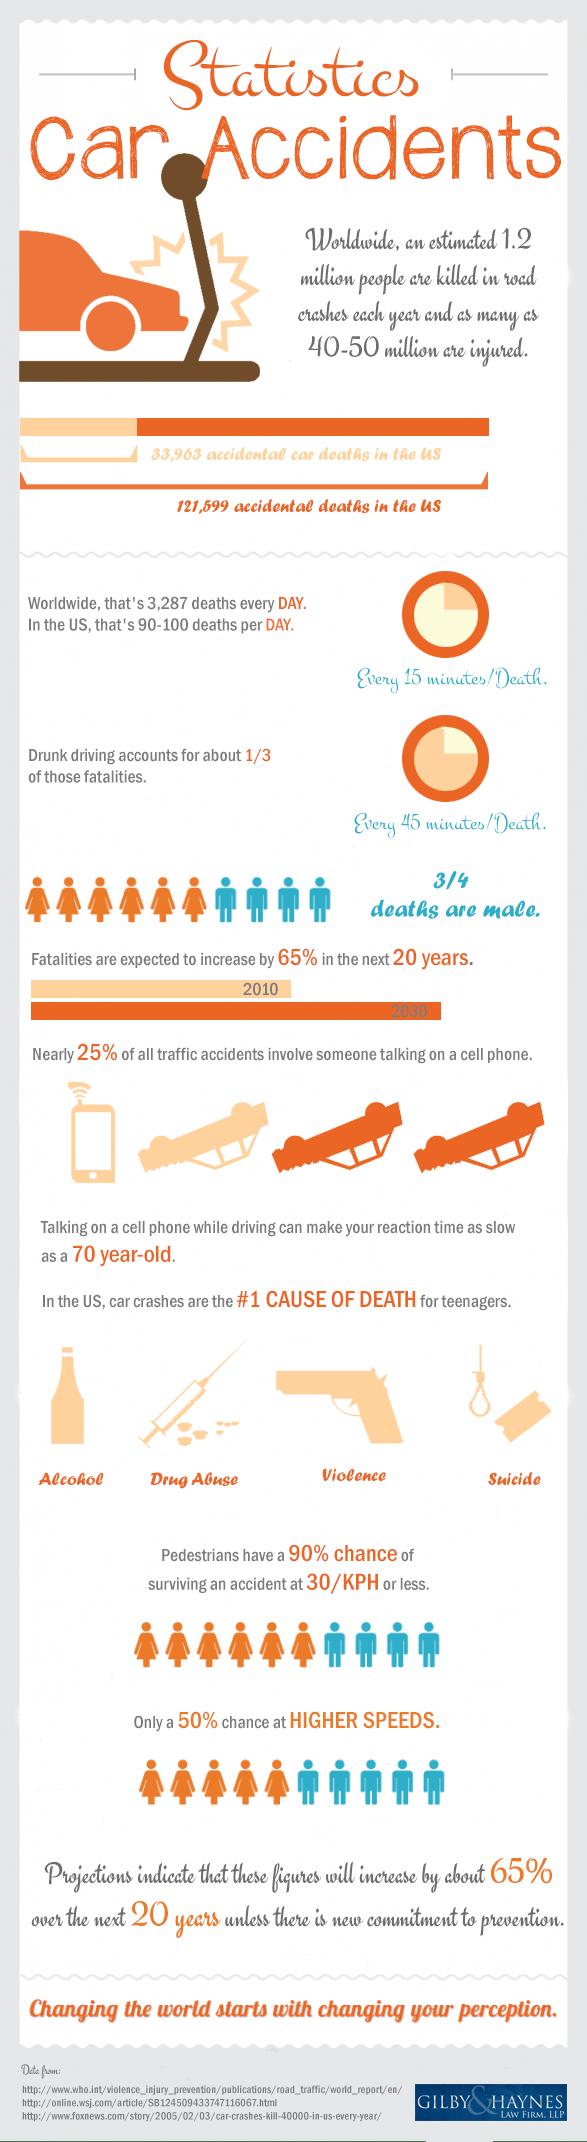 Car Accidents Statistics Infographic